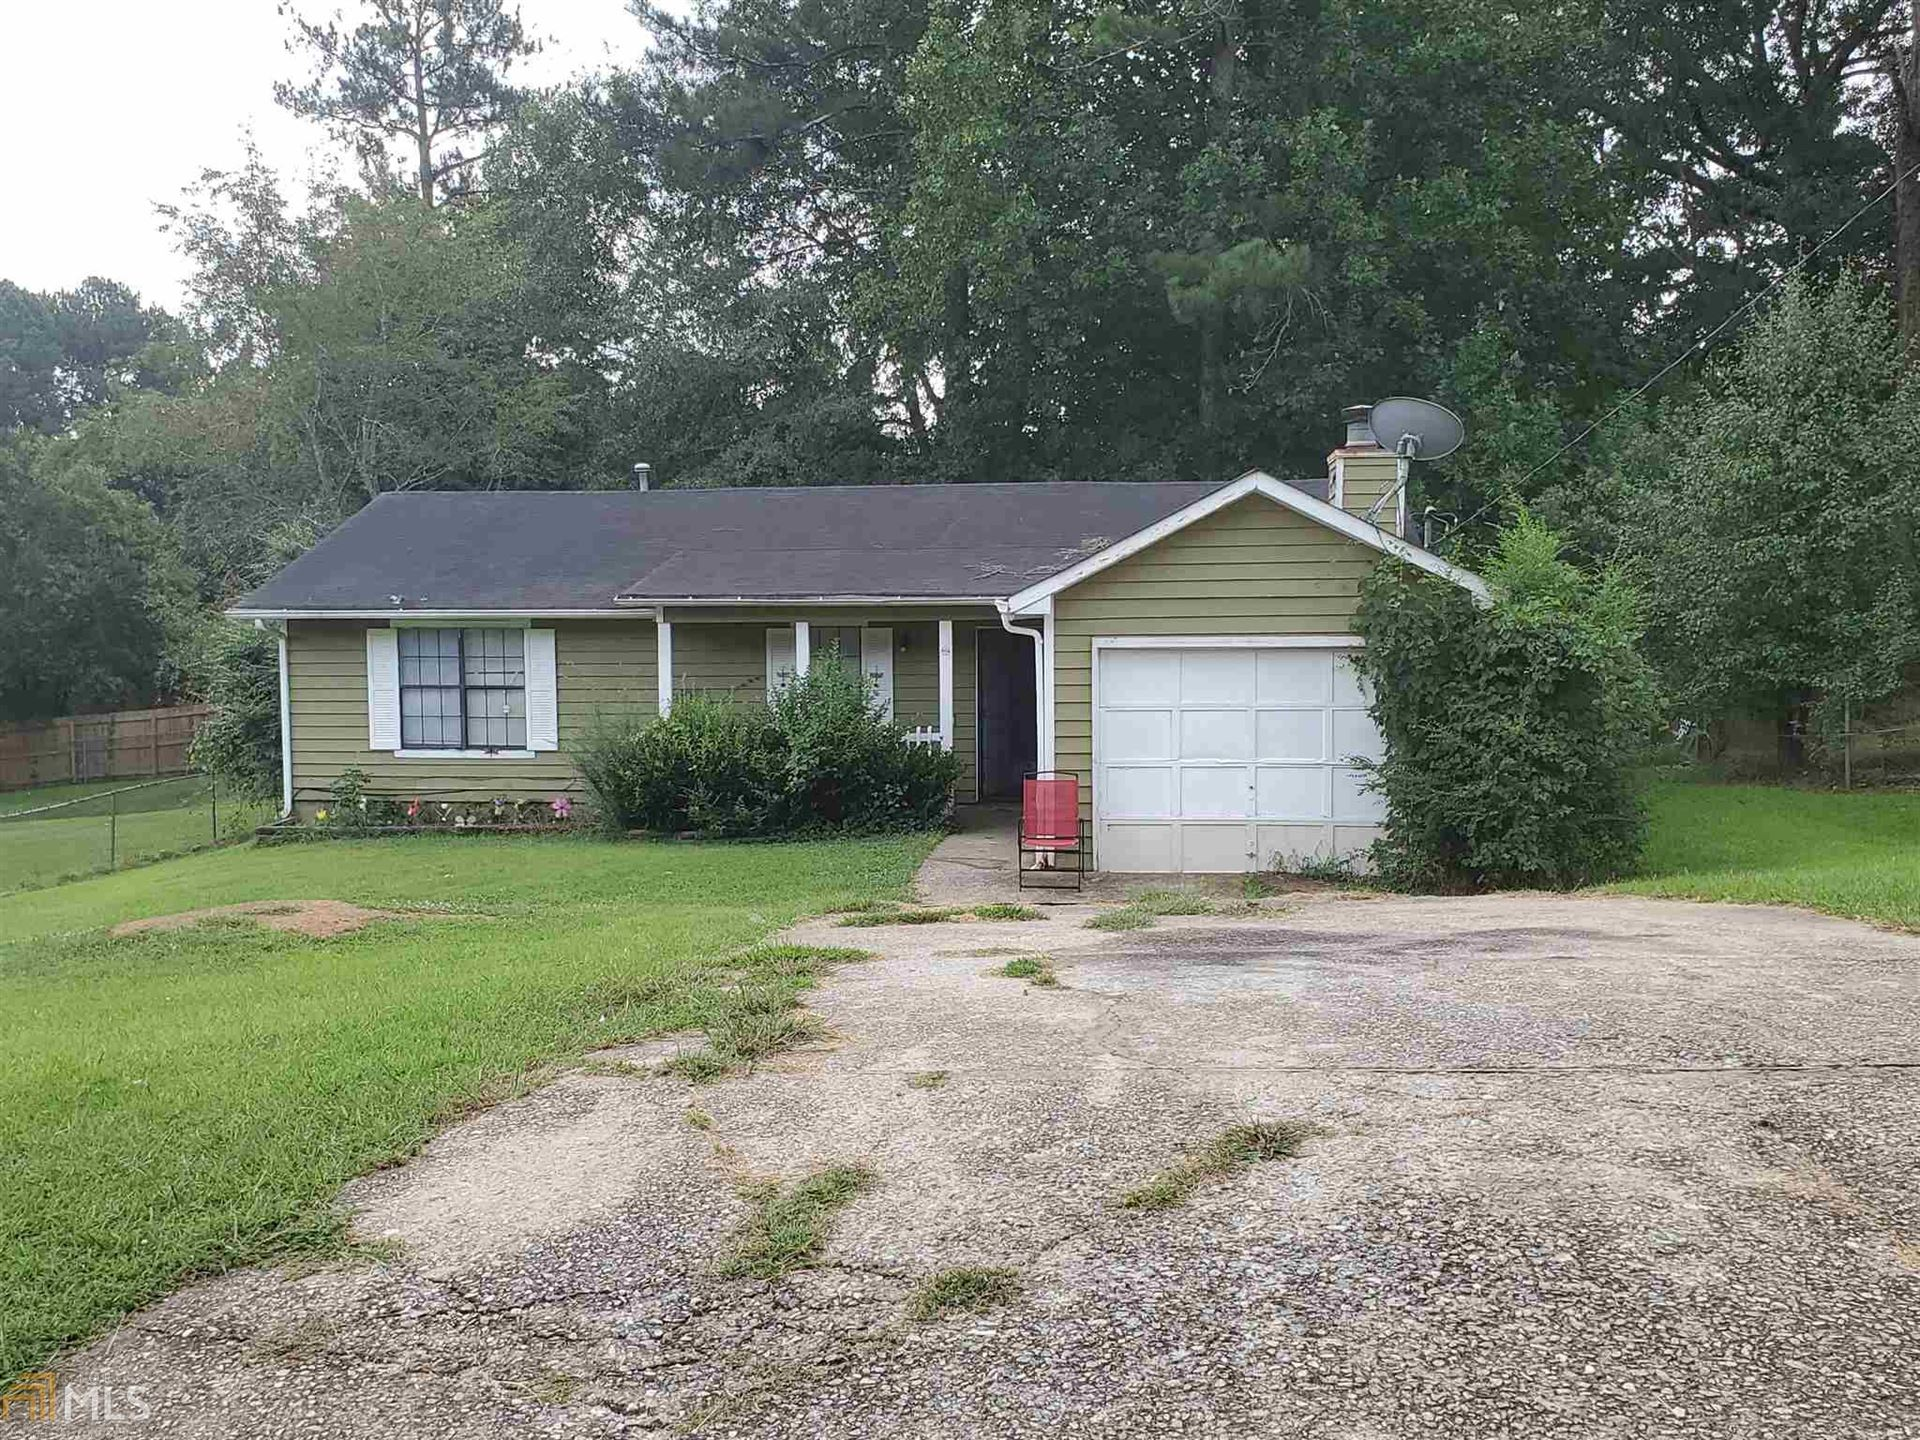 341 Nicole Ct, Jonesboro, GA 30238 - MLS#: 8853931